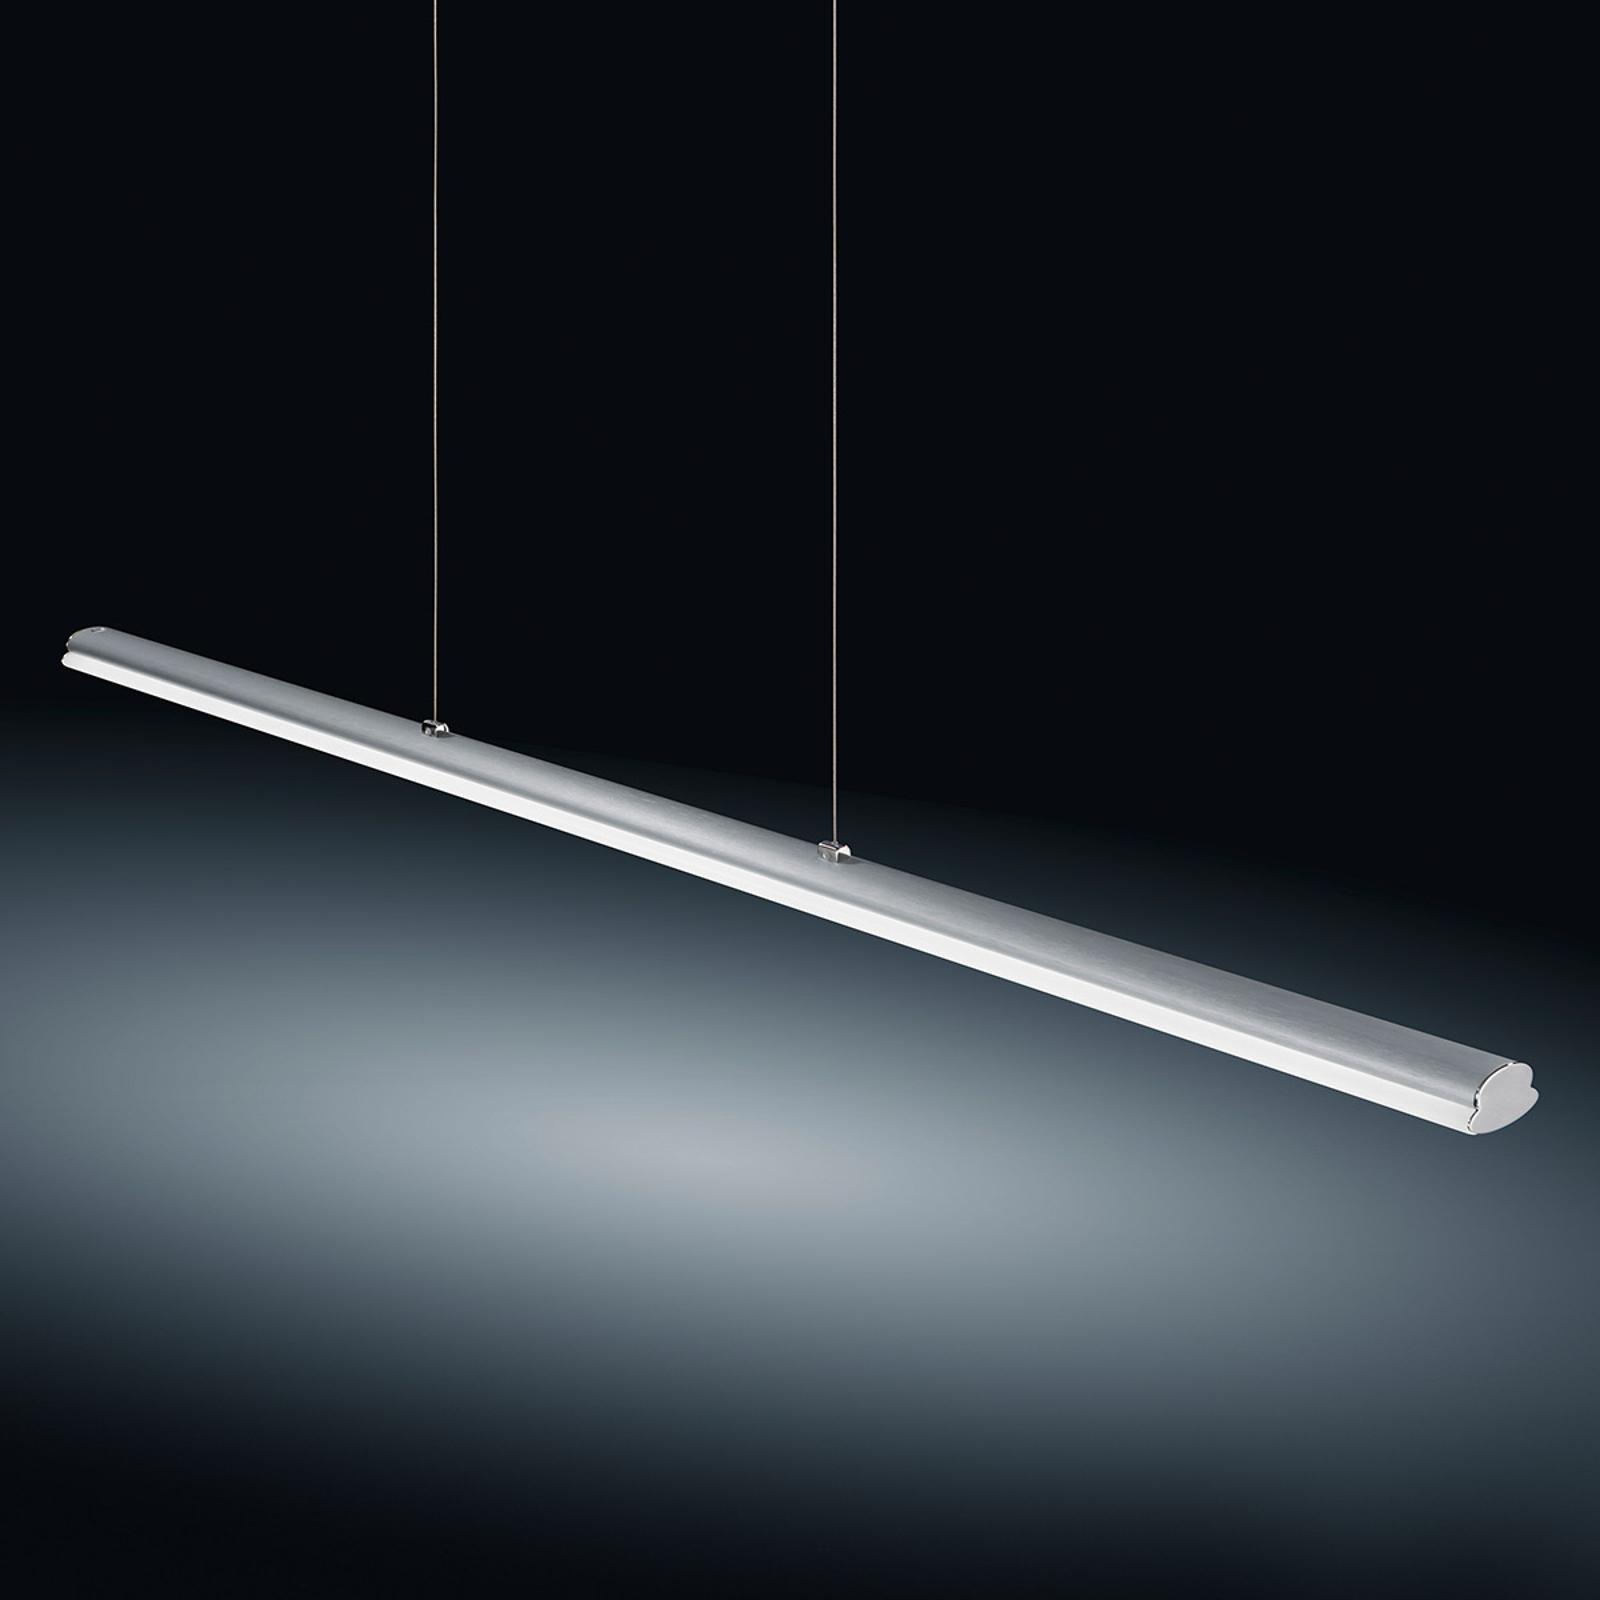 Lampa wisząca LED VENTA, nikiel mat, 116,5 cm, 22W